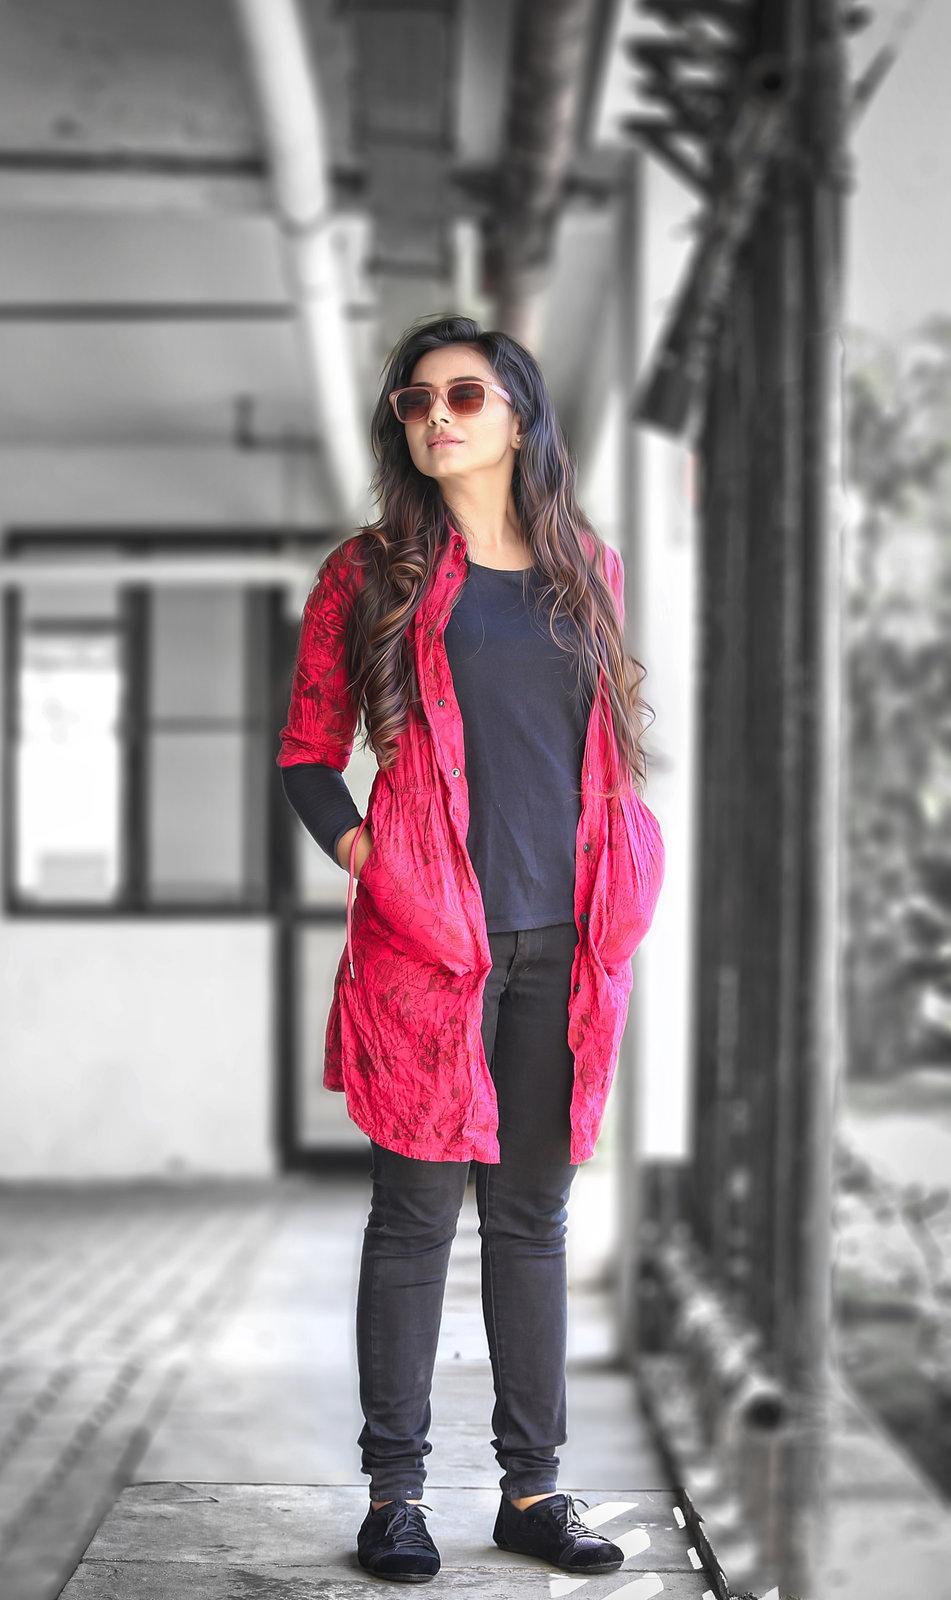 Mrudula Murali beautiful photo shoot-HQ-Photo-6